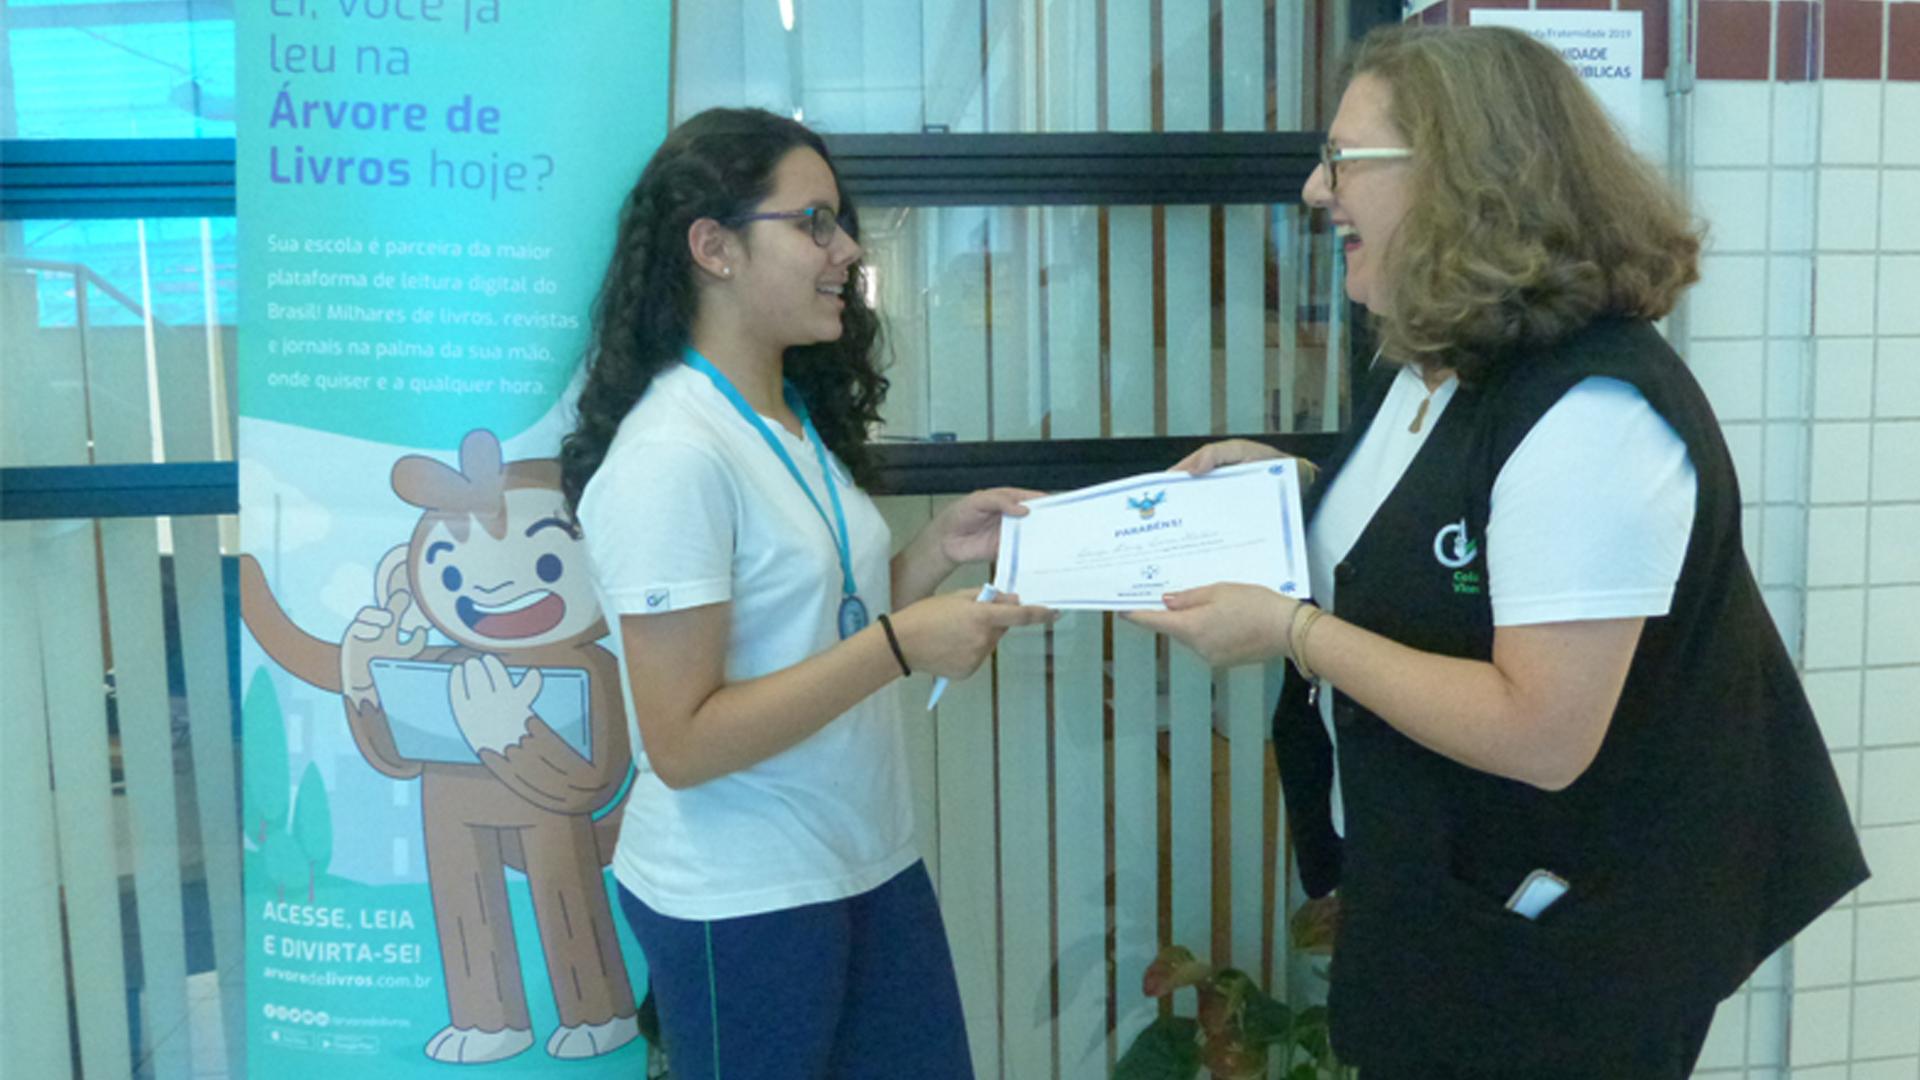 [Luiza Diniz Lima Monteório do 7° Ano,conquistou o Nível Diamante de leitores da Árvore de livros . Parabéns Luiza!]